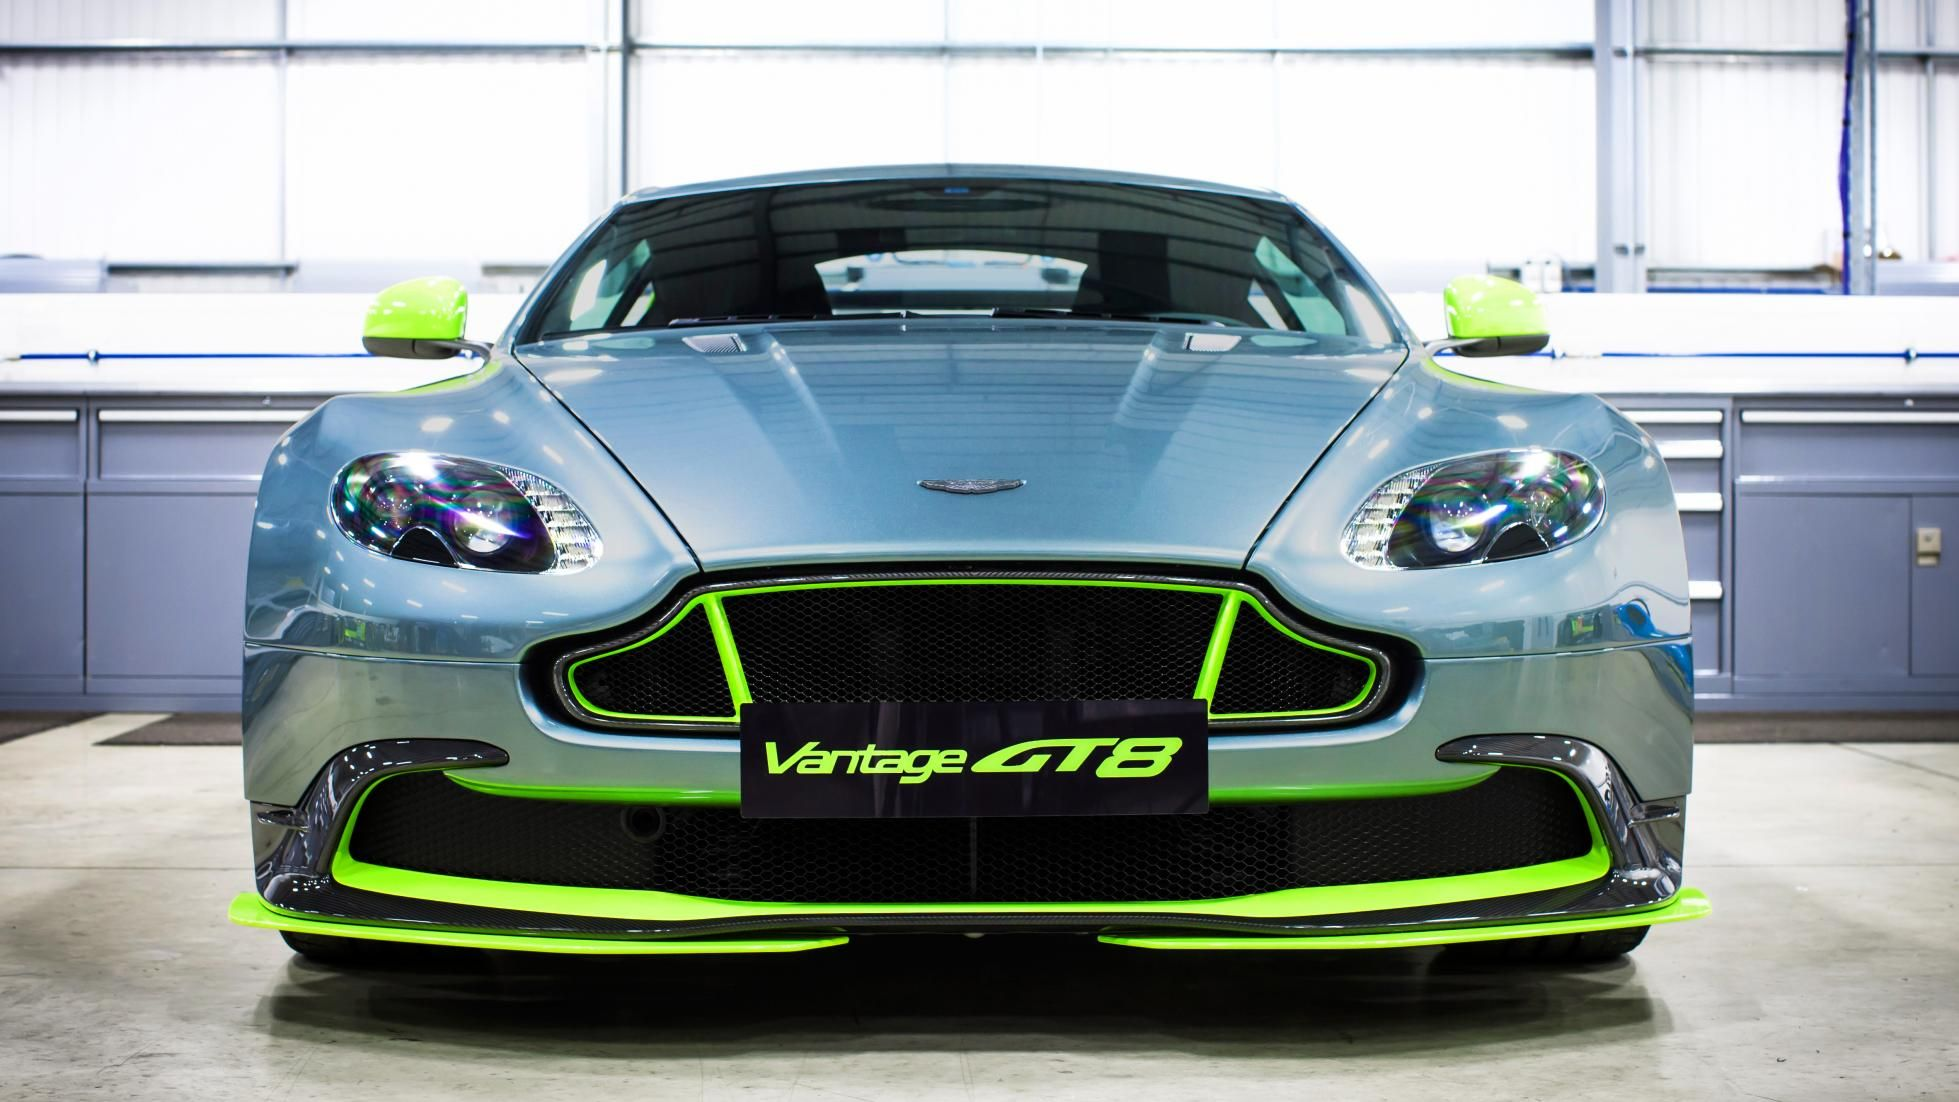 Aston Martin Vantage GT8 (2016-n/a)